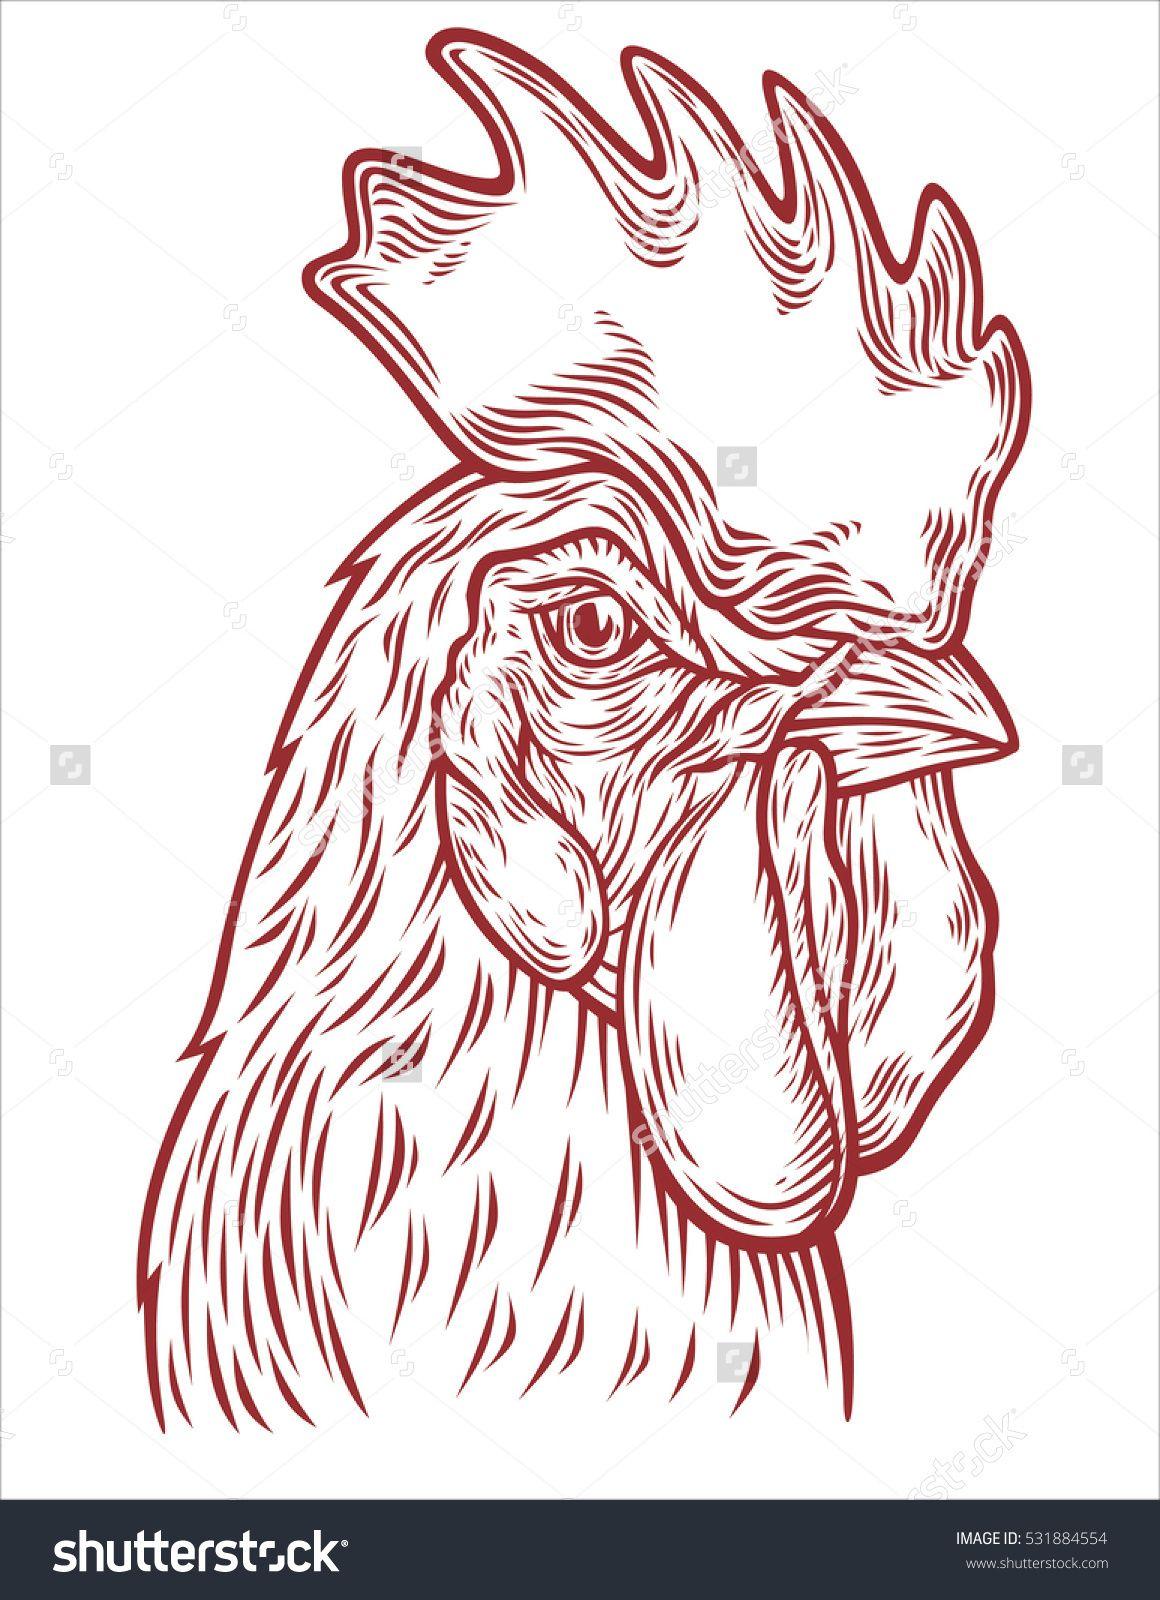 Hand Drawn Rooster Head Vector Illustration Sketch Chicken Portrait